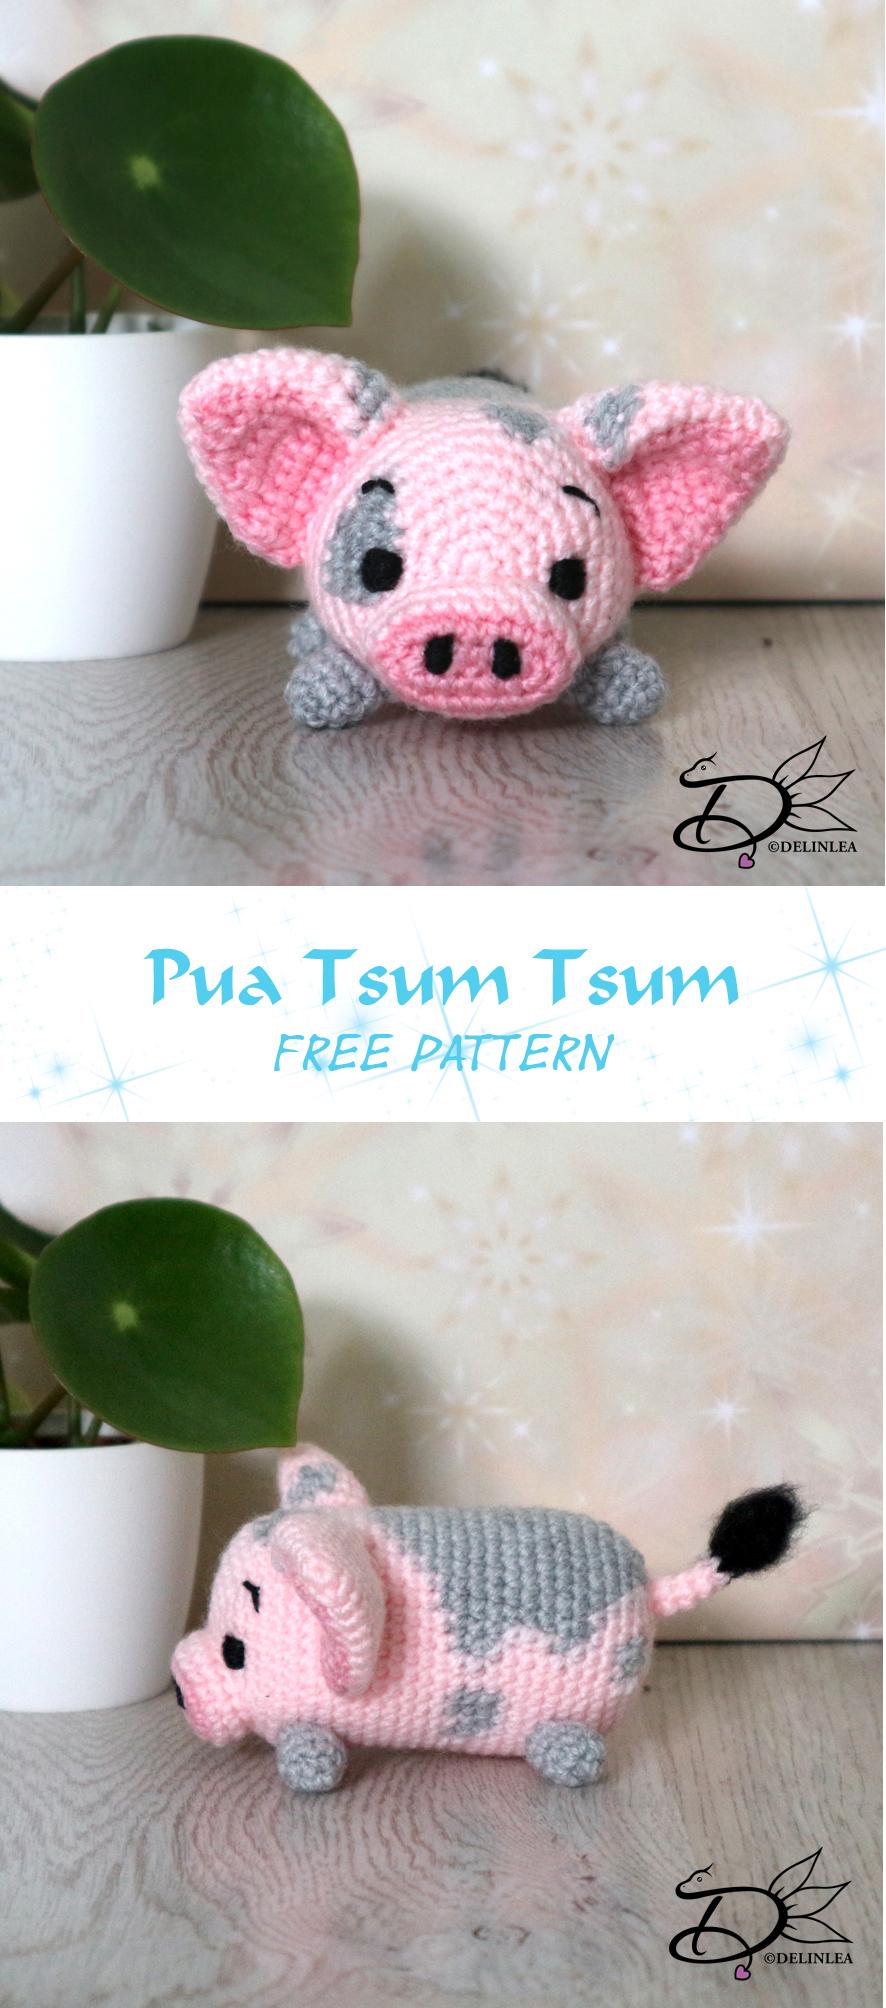 Stitch from Lilo & Stitch Amigurumi Crochet (Pattern Only) - Ollie ... | 2008x886